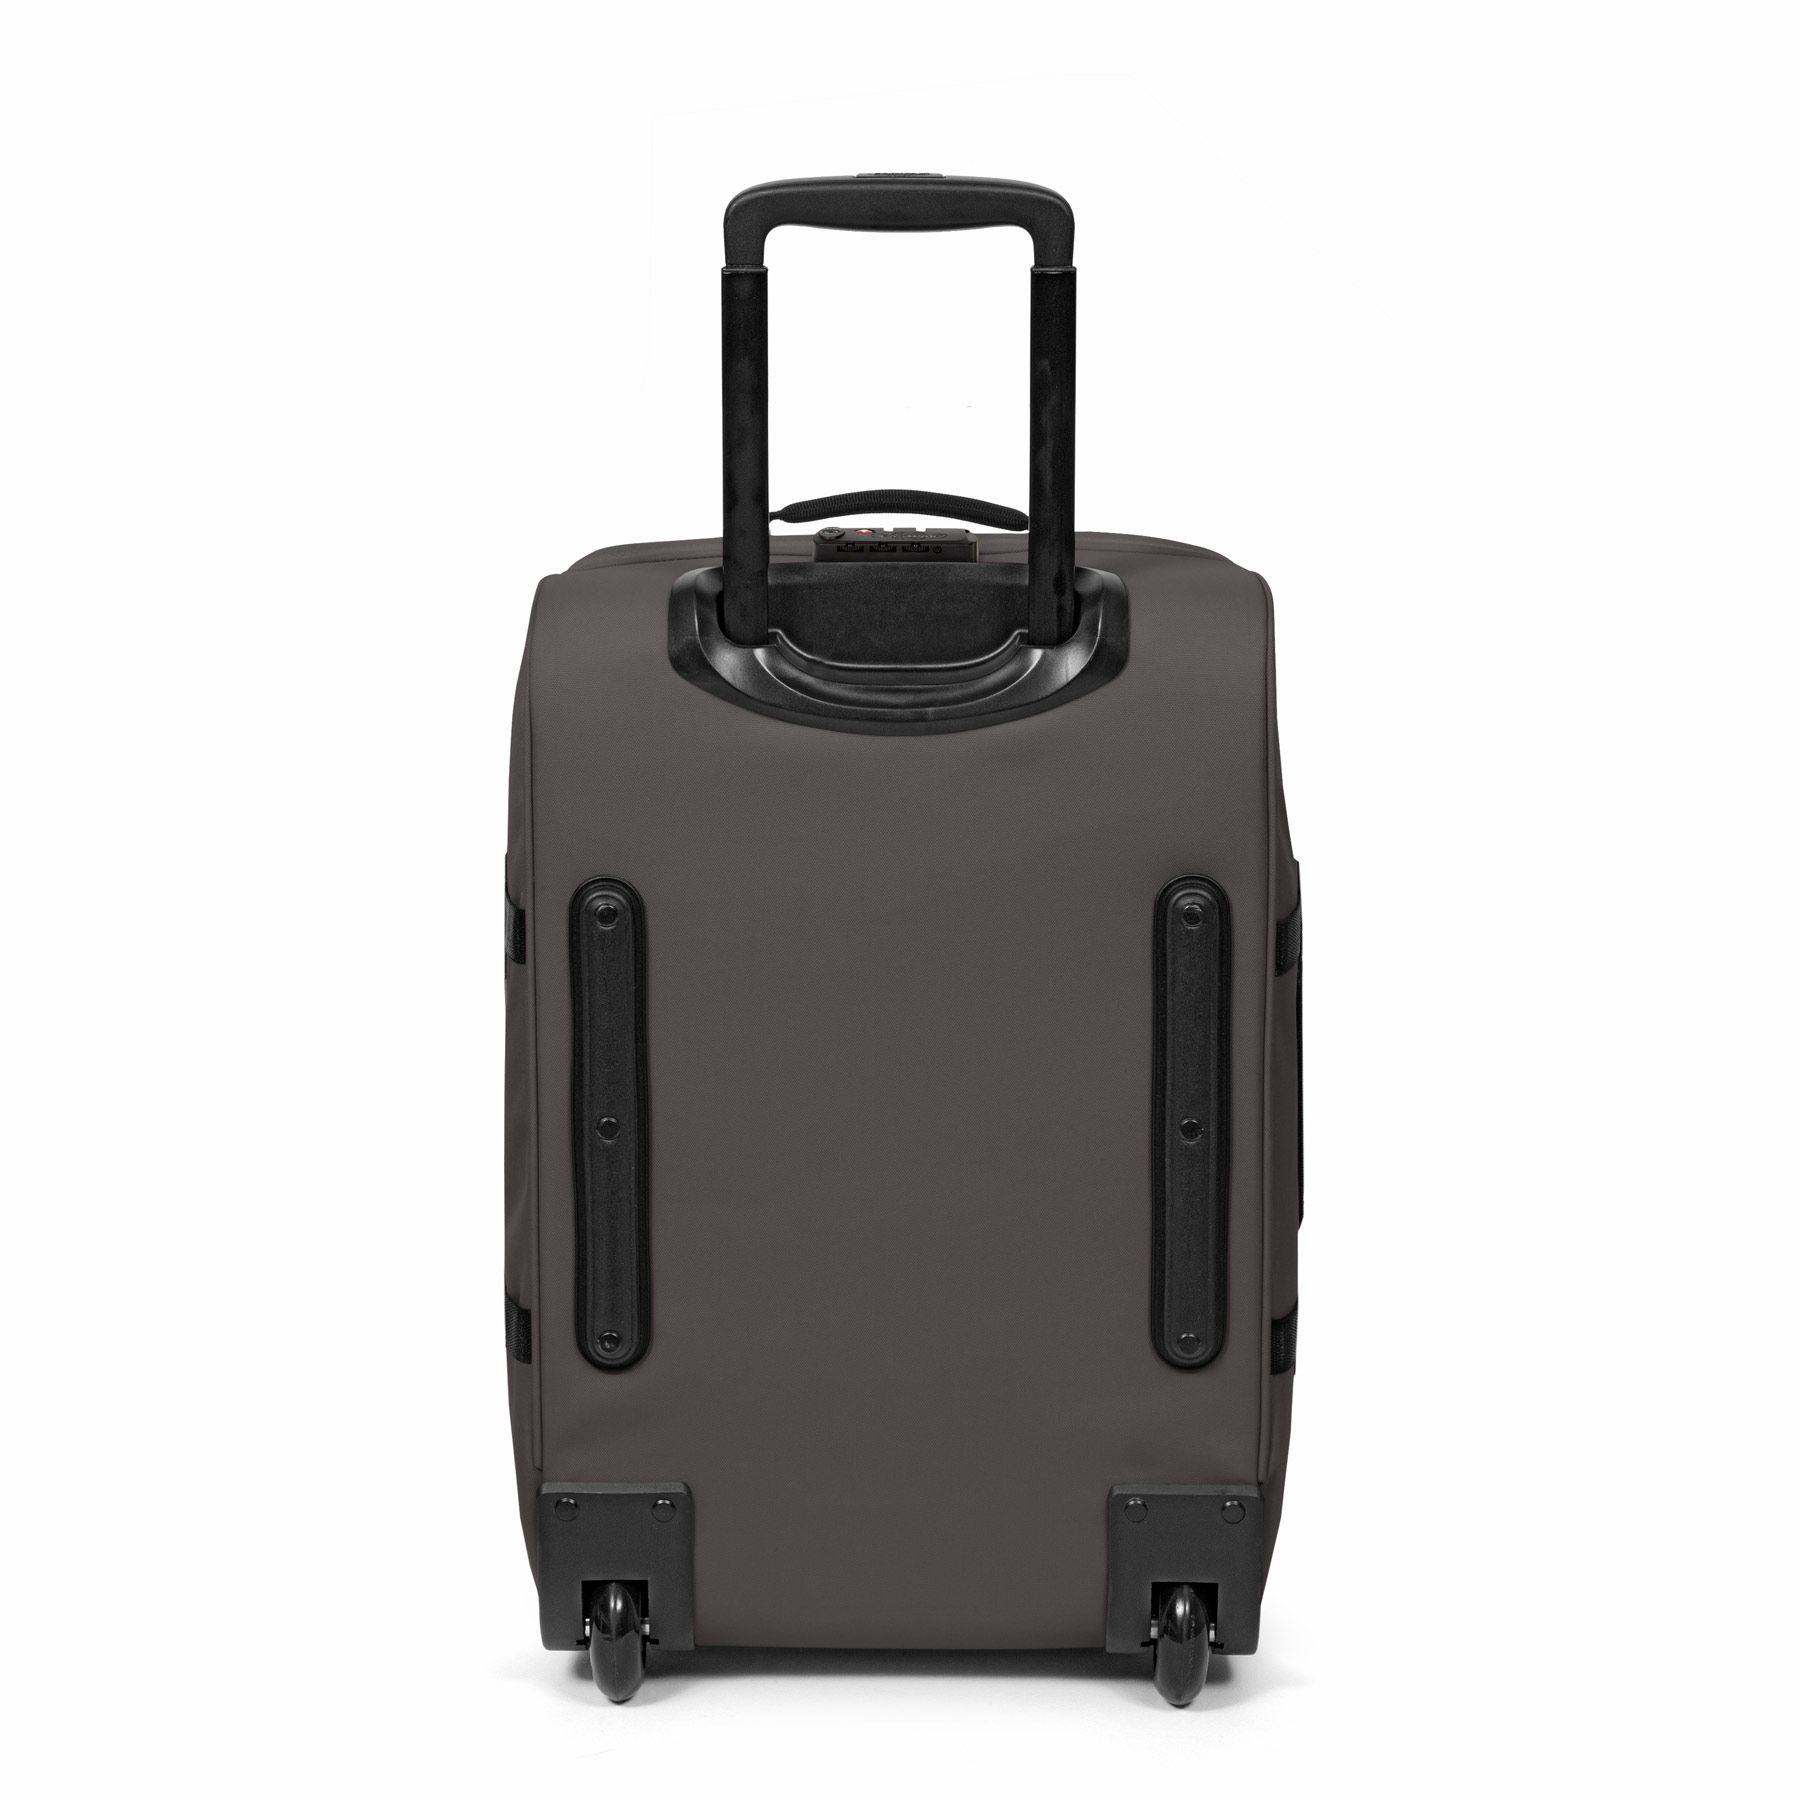 Eastpak Eastpak Tranverz S Simple Grey Handbagage reistas met trolley en wieltjes